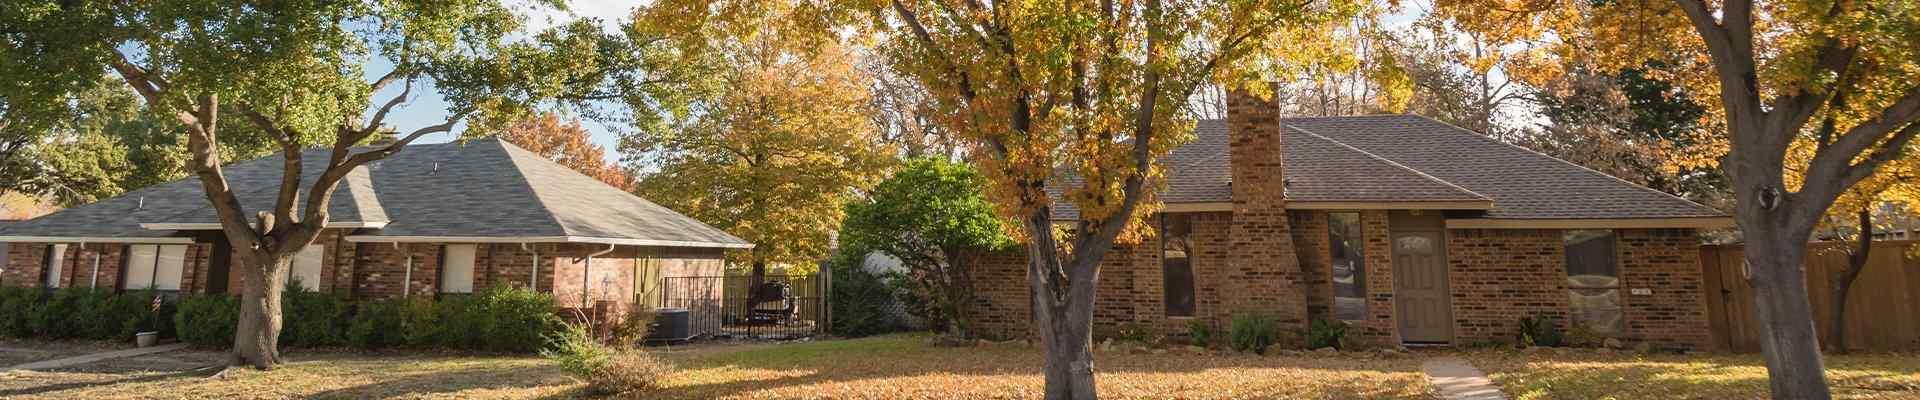 a row of homes in a suburban neighborhood in anna texas